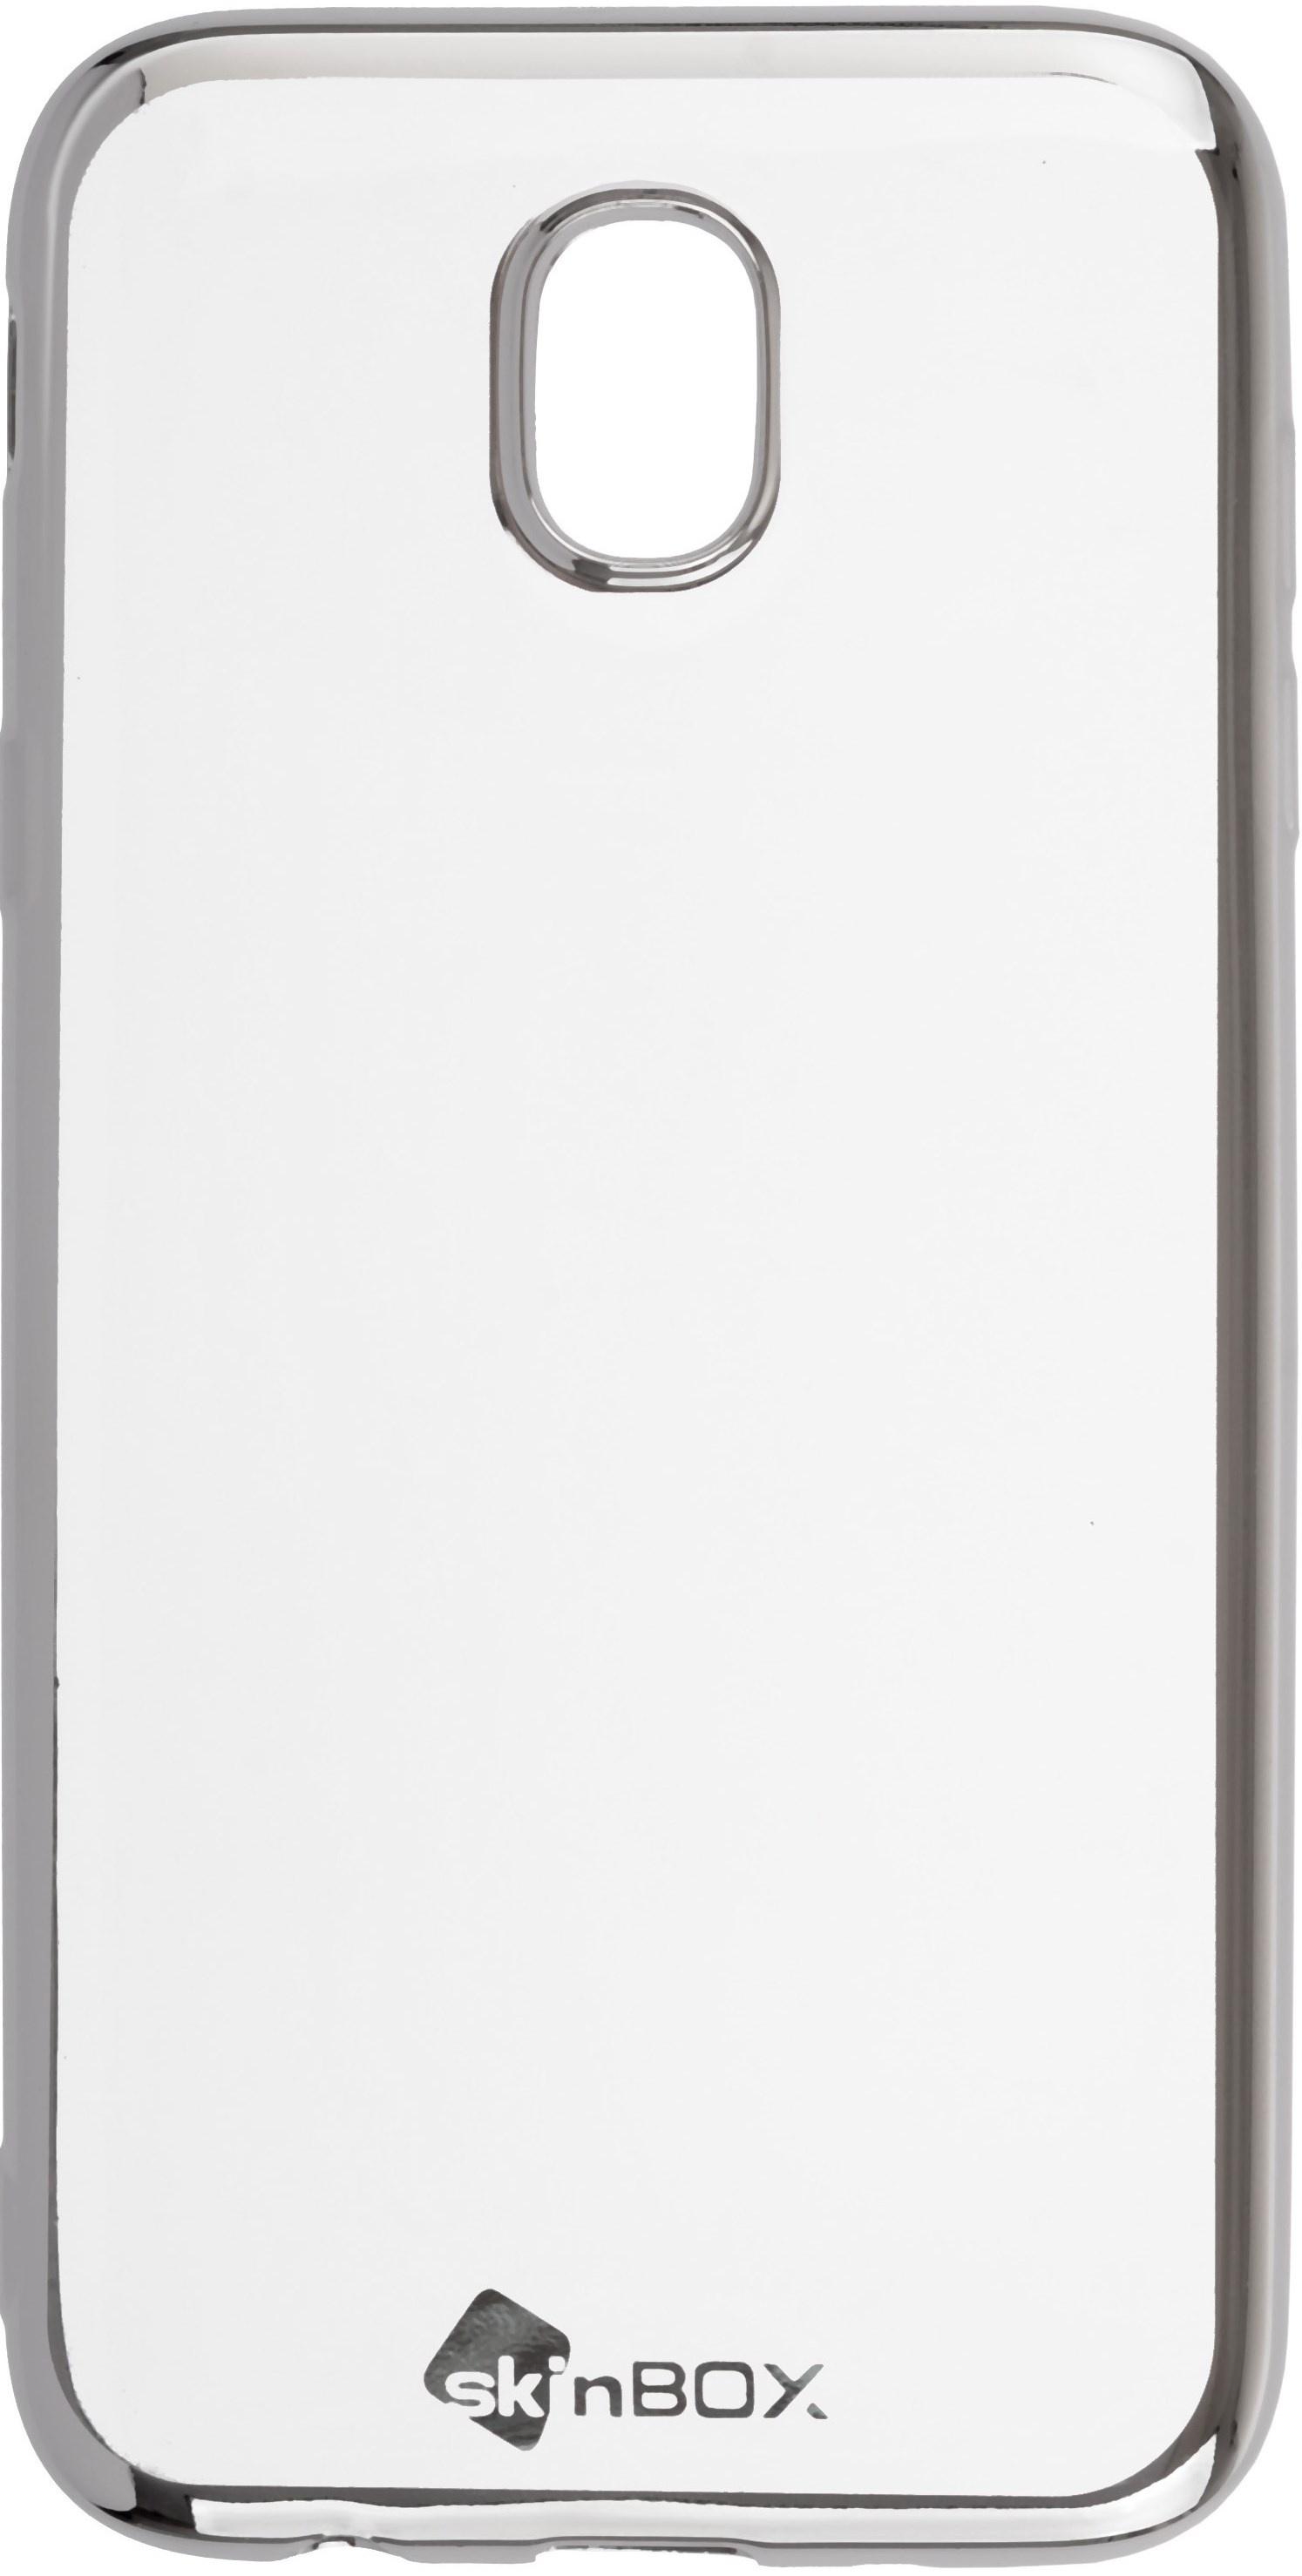 Чехол для сотового телефона skinBOX Silicone chrome border, 4630042529786, серебристый чехол для сотового телефона skinbox silicone chrome border 4630042528697 серебристый